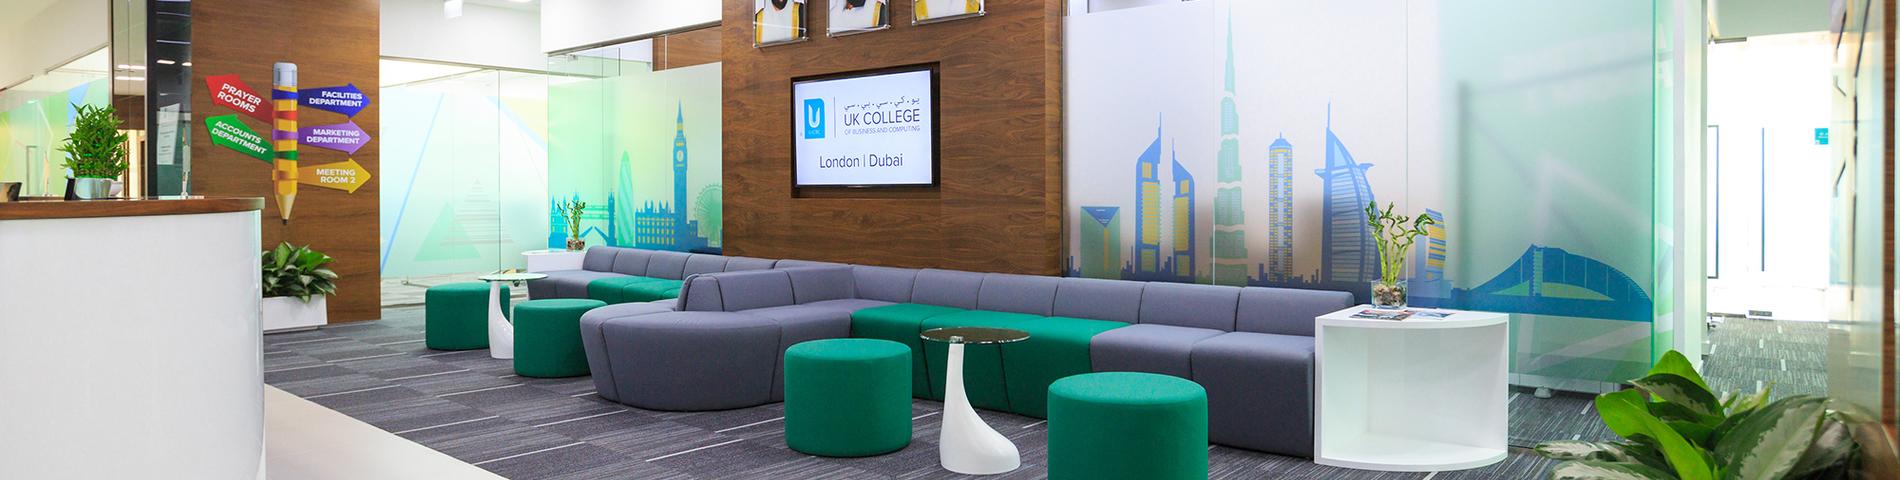 1 фотографий UK College of Business and Computing